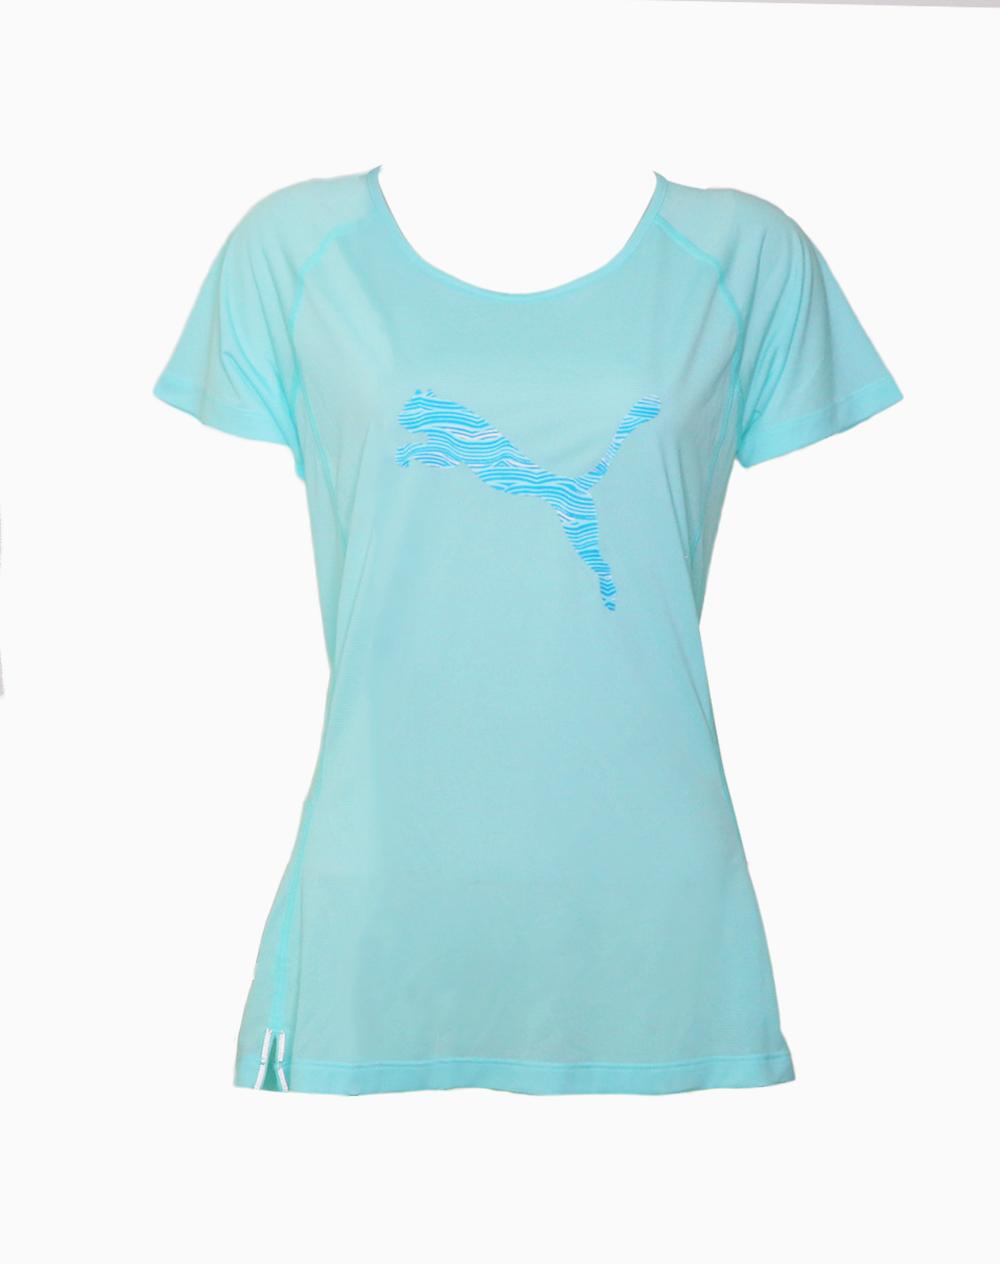 Women's Core Run Logo Tee in Island Paradise by Puma | XL